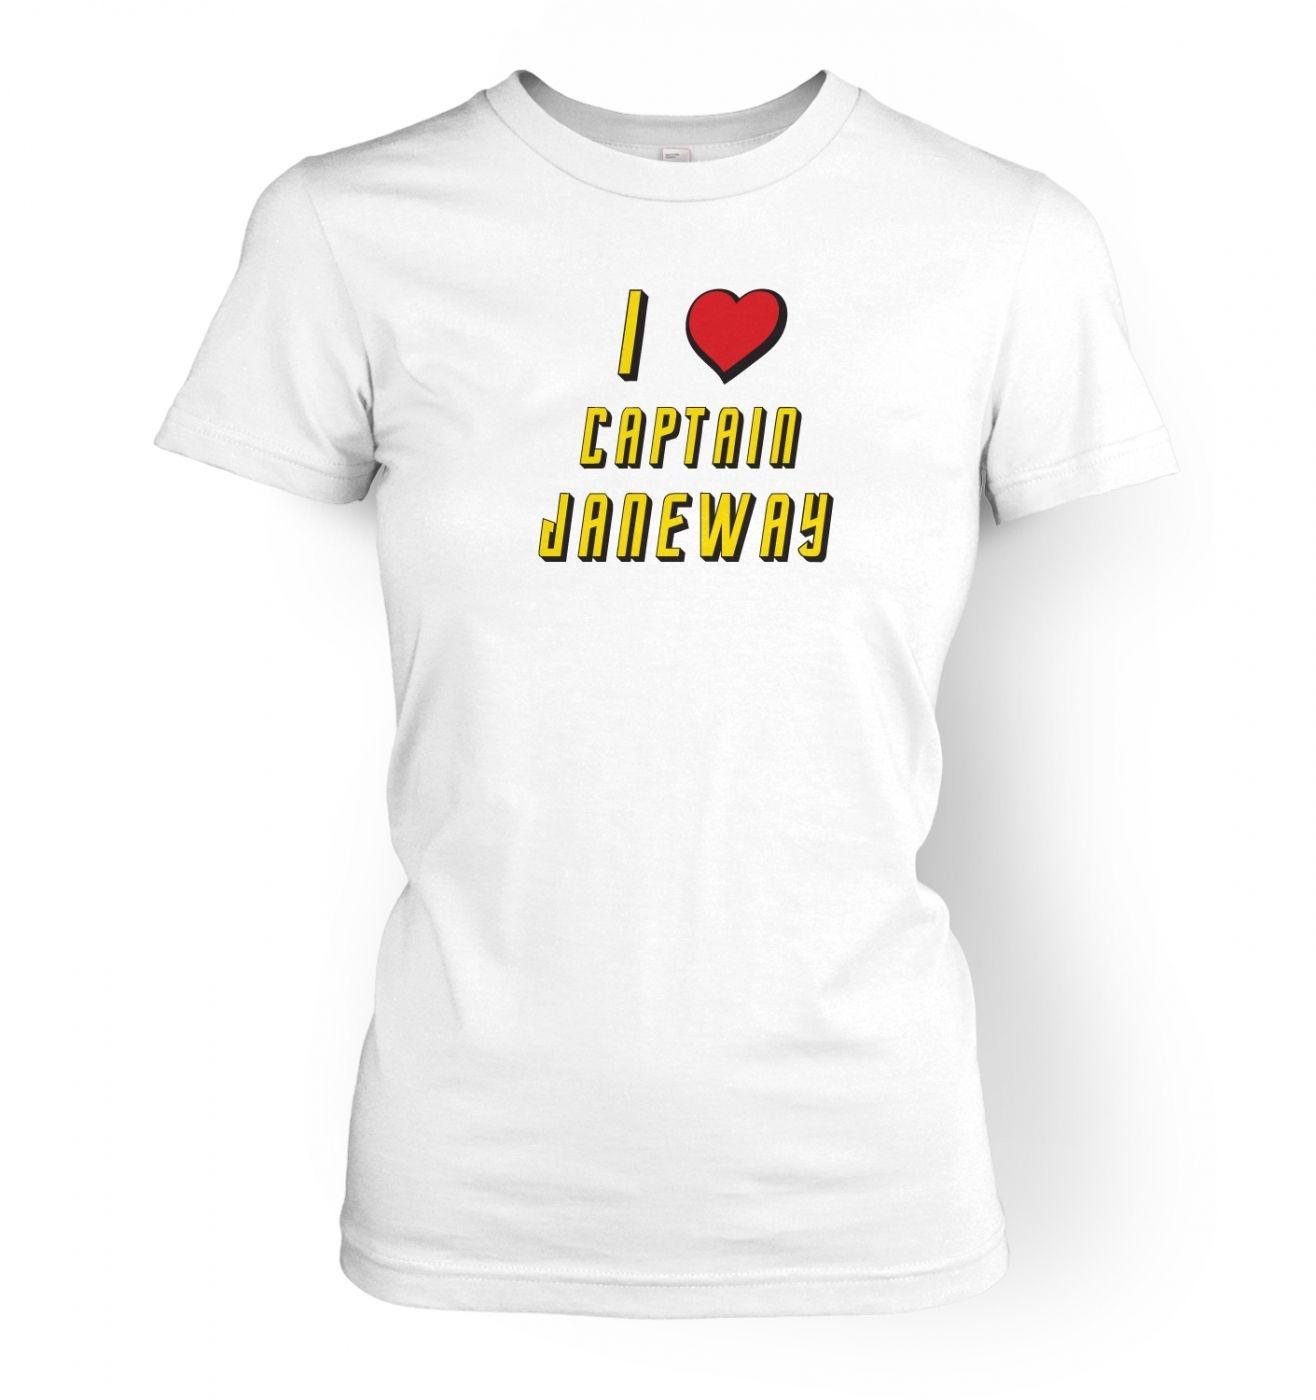 Women's I heart Captain Janeway t-shirt